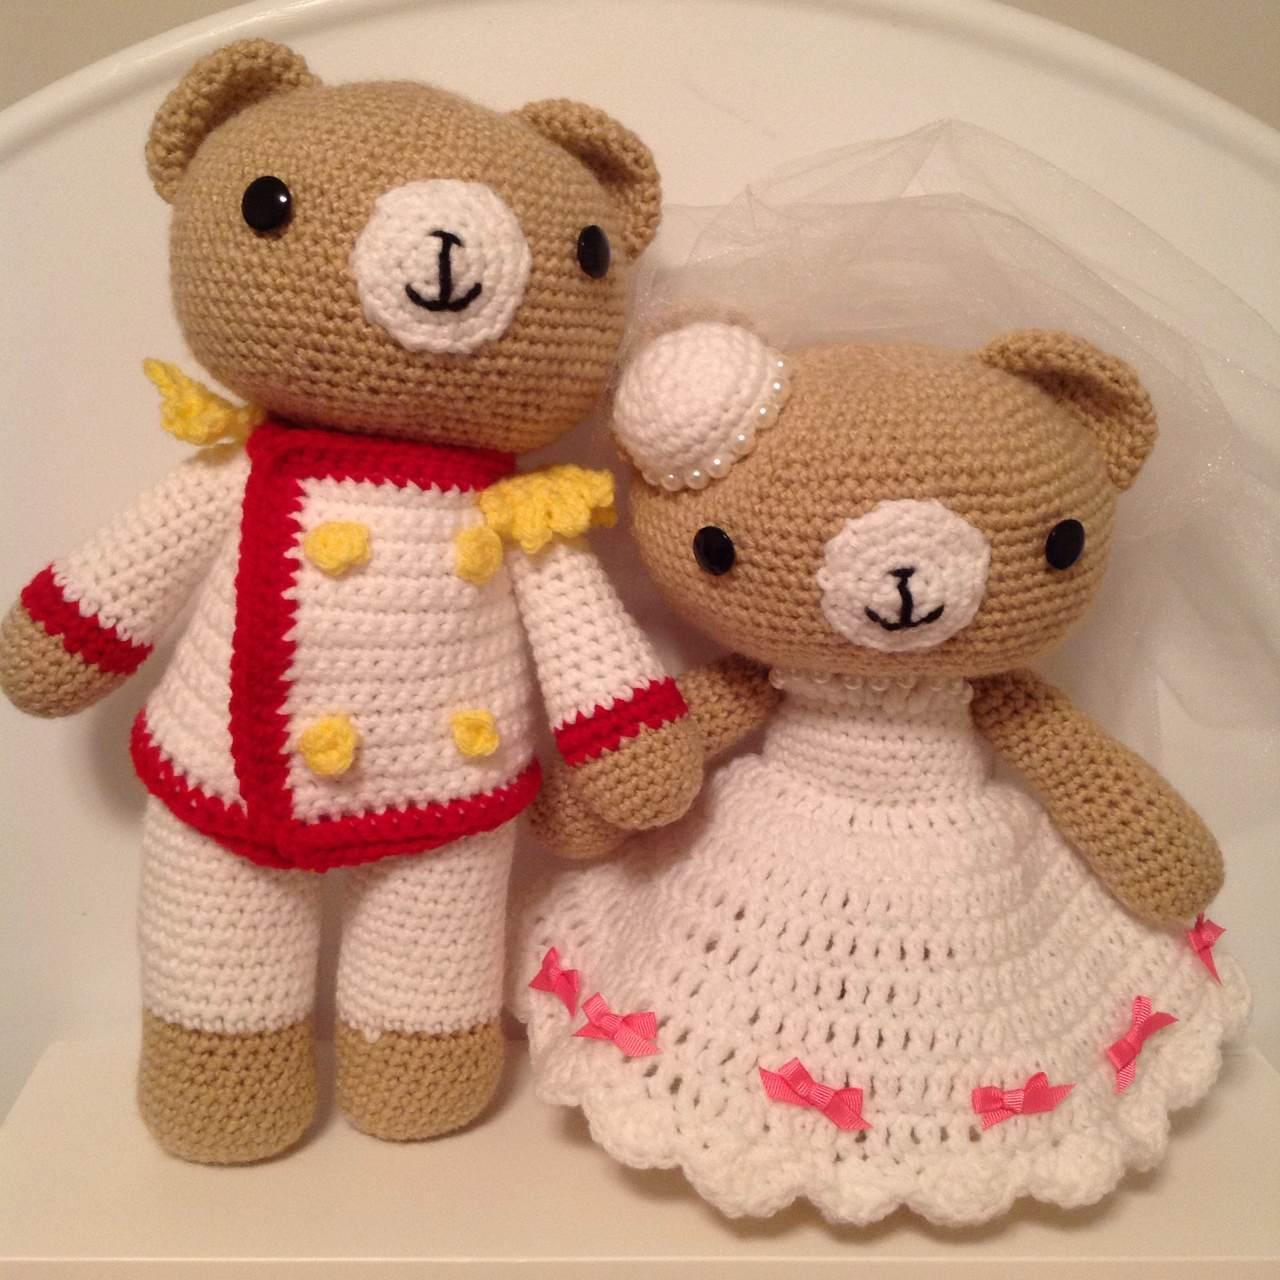 Crochet Wedding Gift Patterns: Pattern – Crochet Wedding Bear Couple